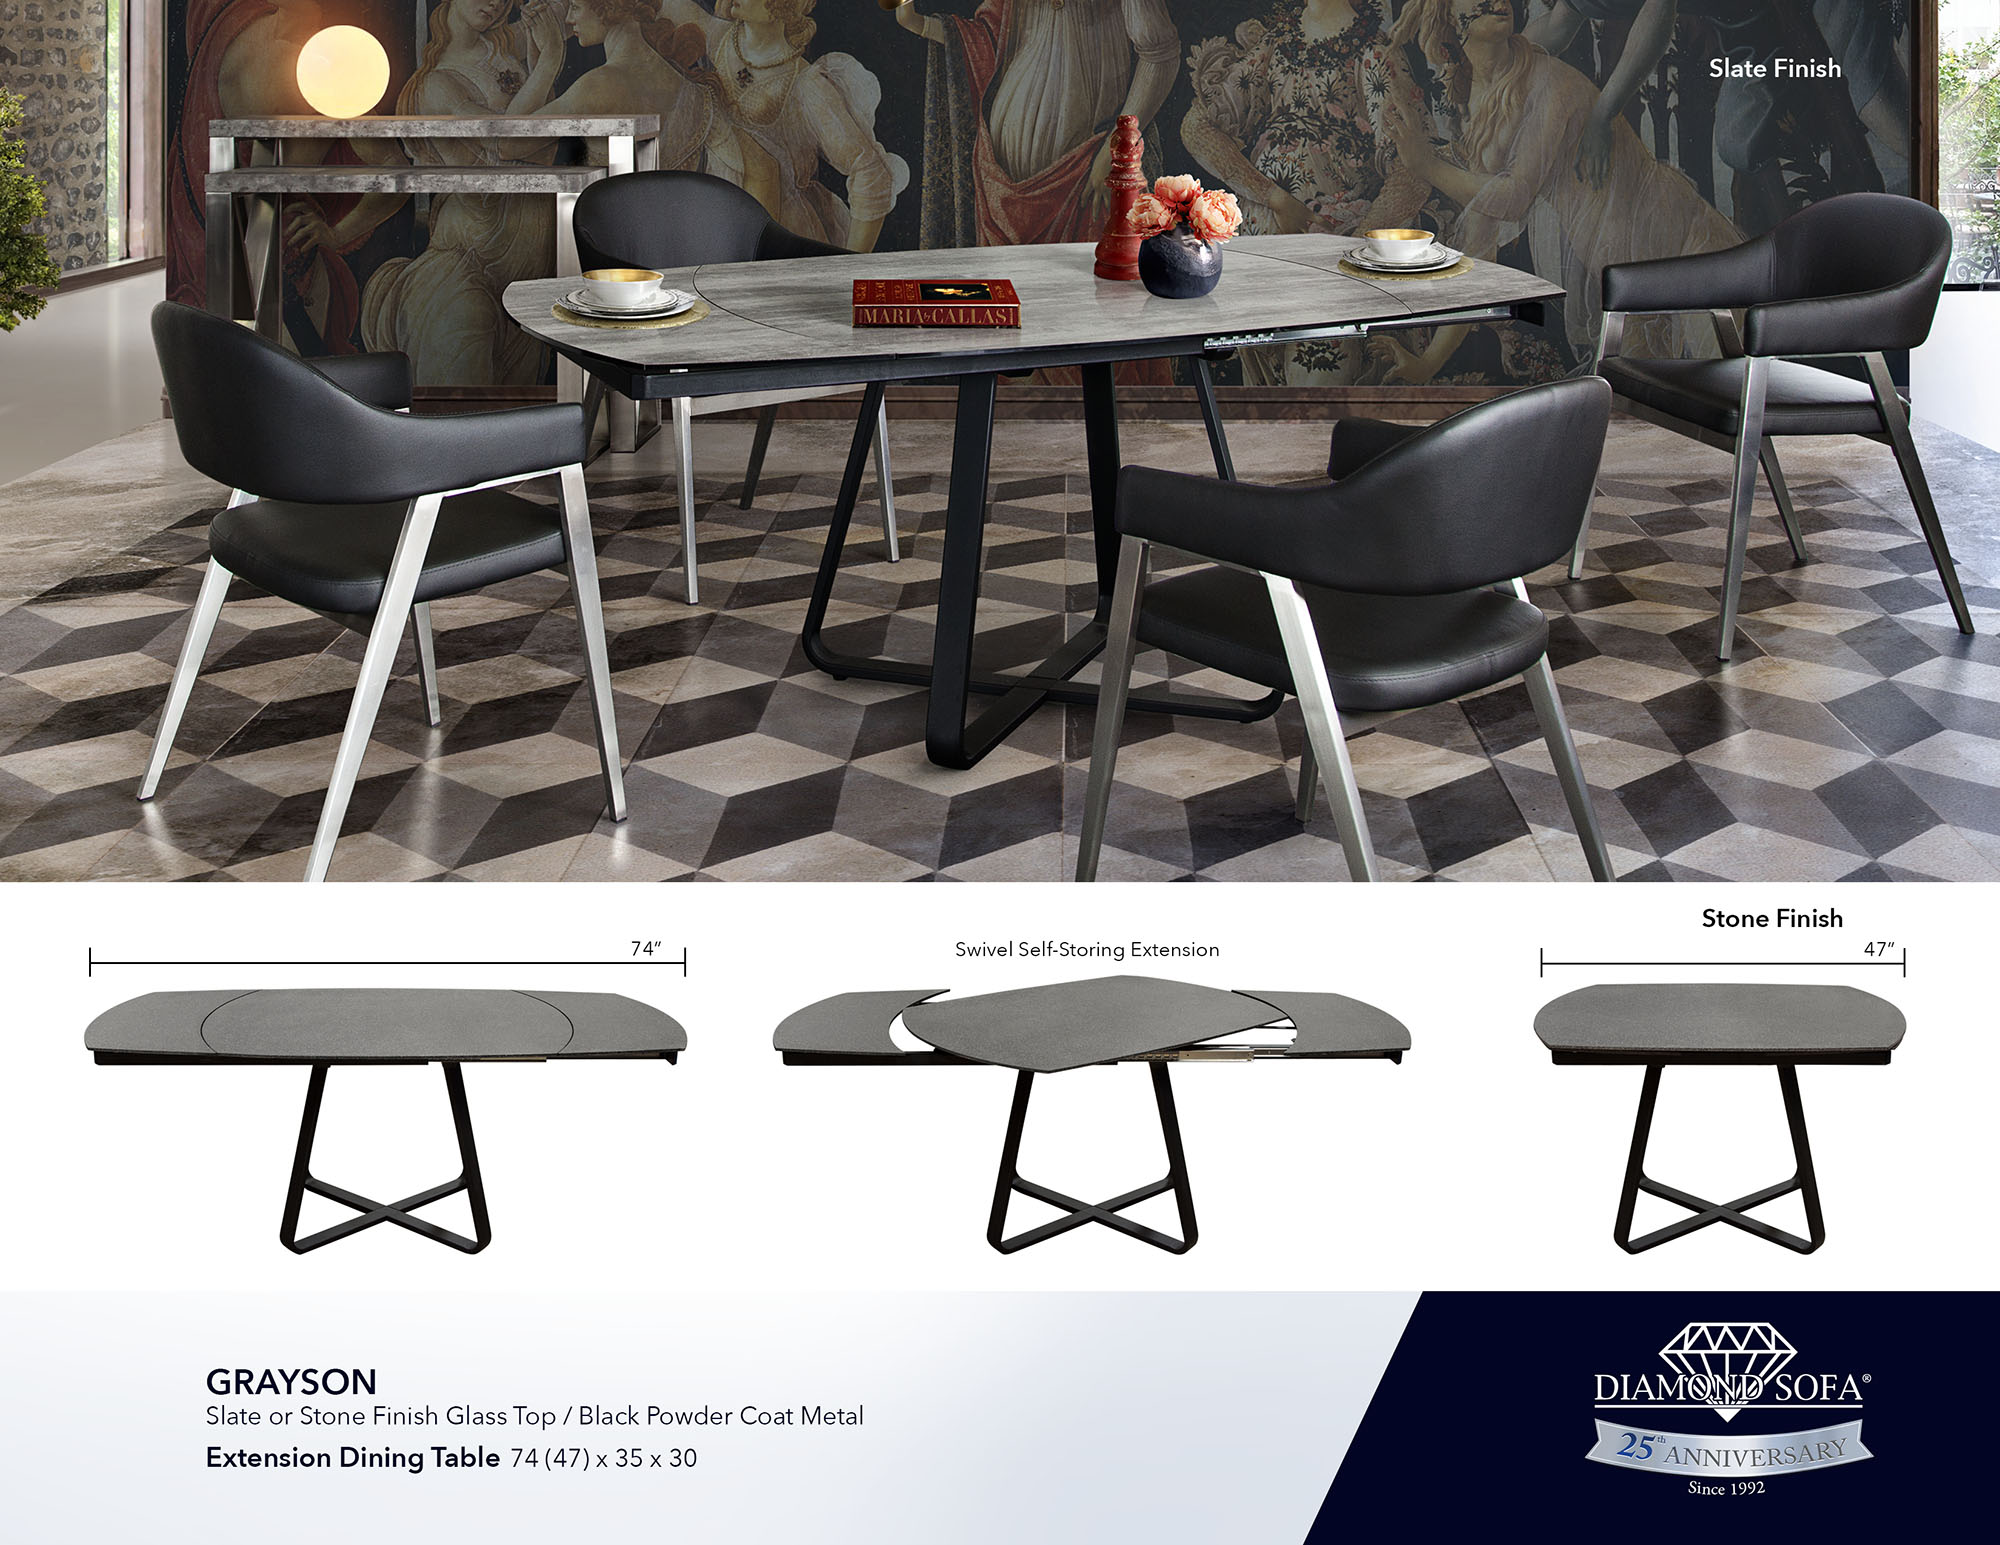 greyson-extension-dining-table.jpg